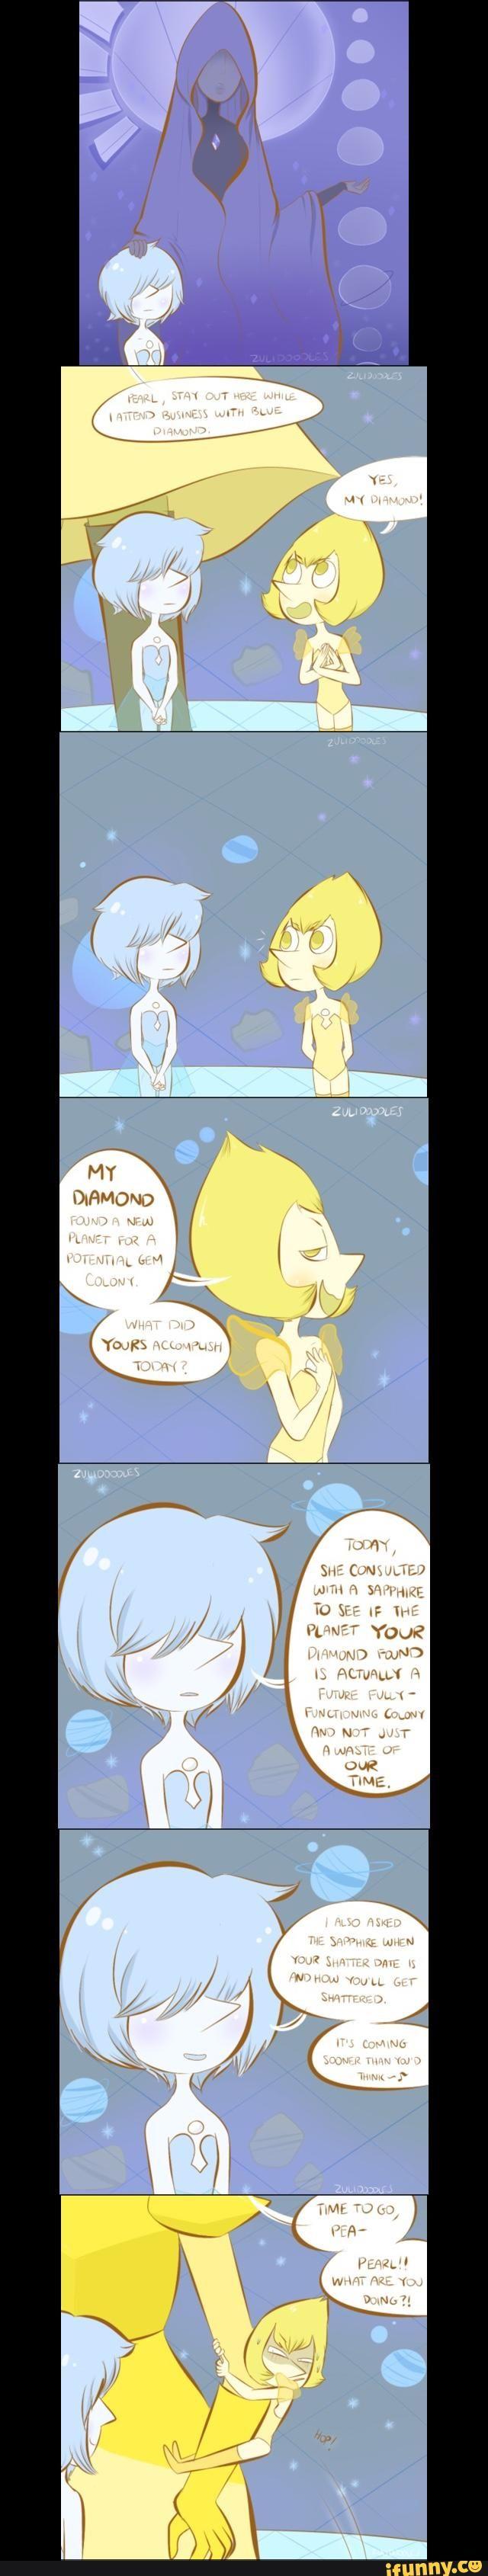 pearls blue yellow diamond diamonds pearl steven universe cartoon network theory hc headcanons cute cool awesome kawaii funny humour humor art fanart tumblr pinterest headcanon